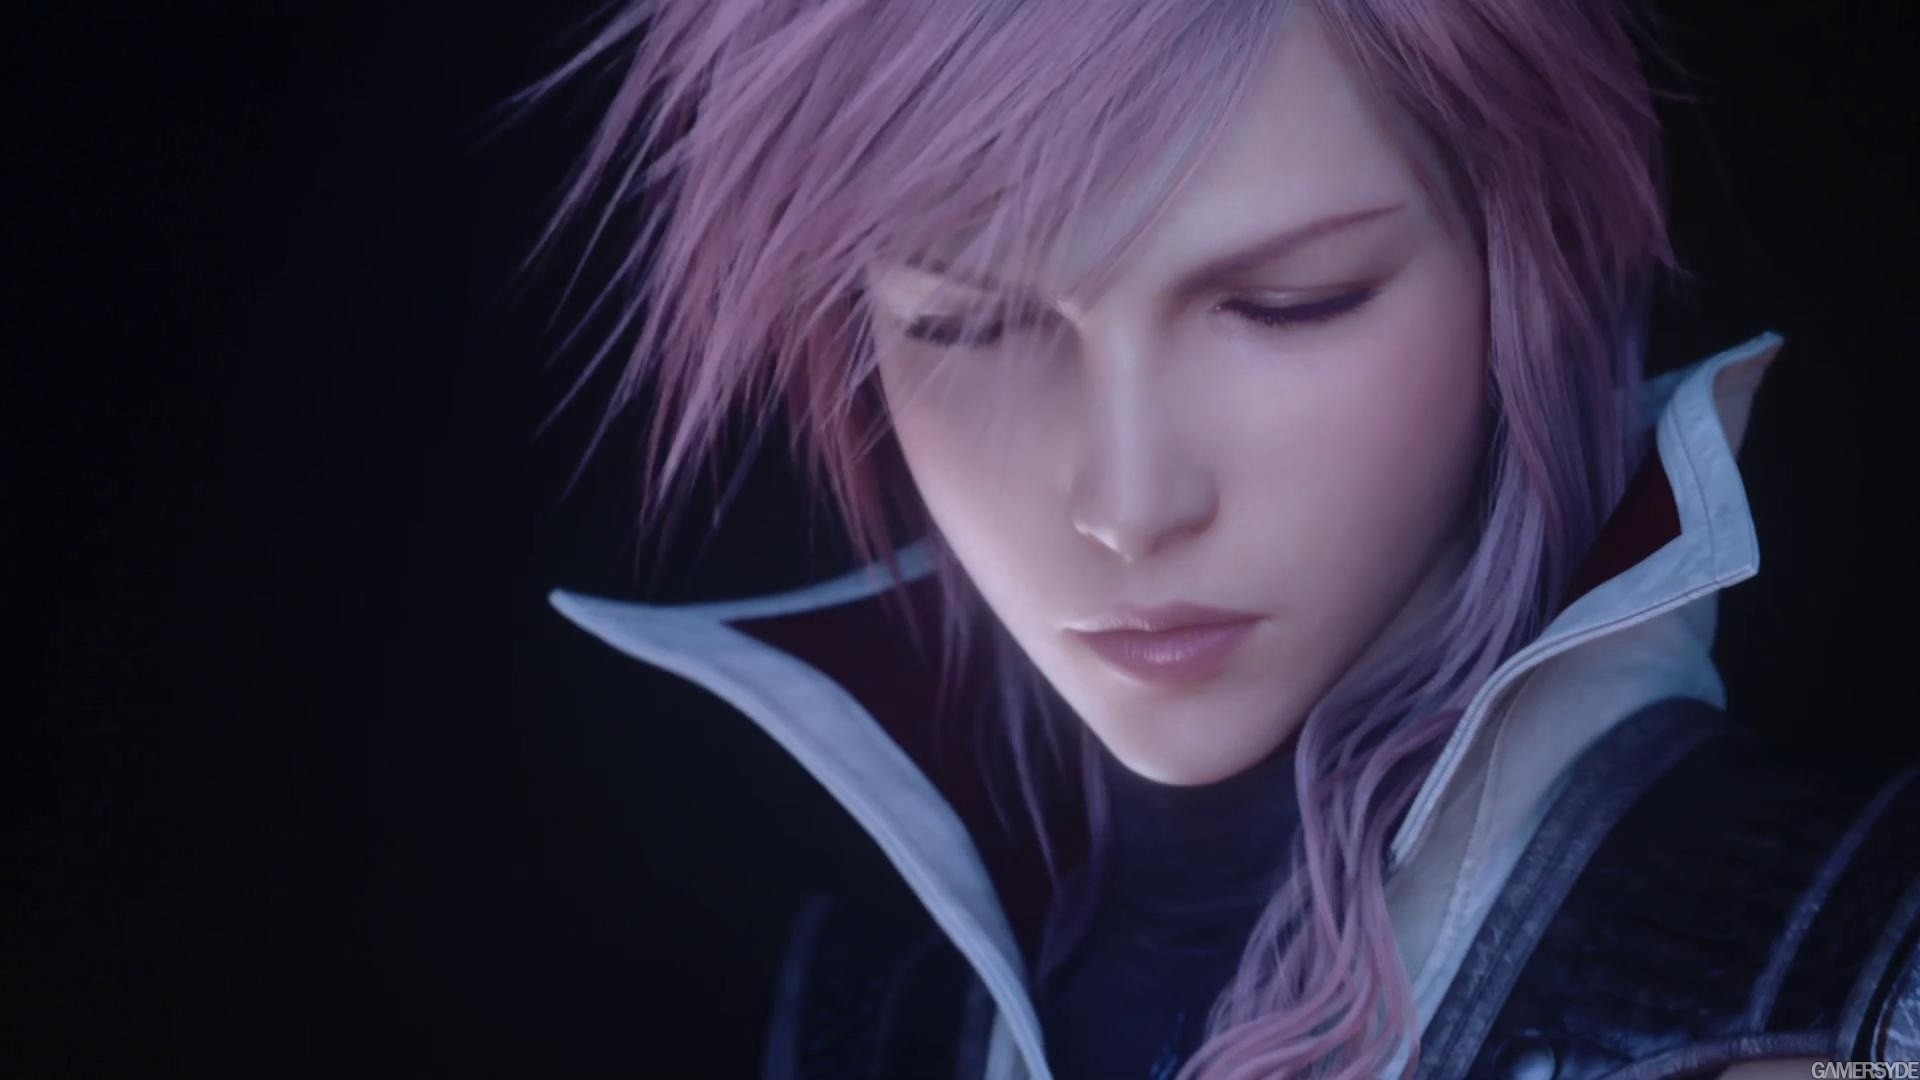 Galerie Lightning Returns: Final Fantasy XIII – Fichier: Trailer E3  (1920×1080) – 2013-06-06 15:12:30